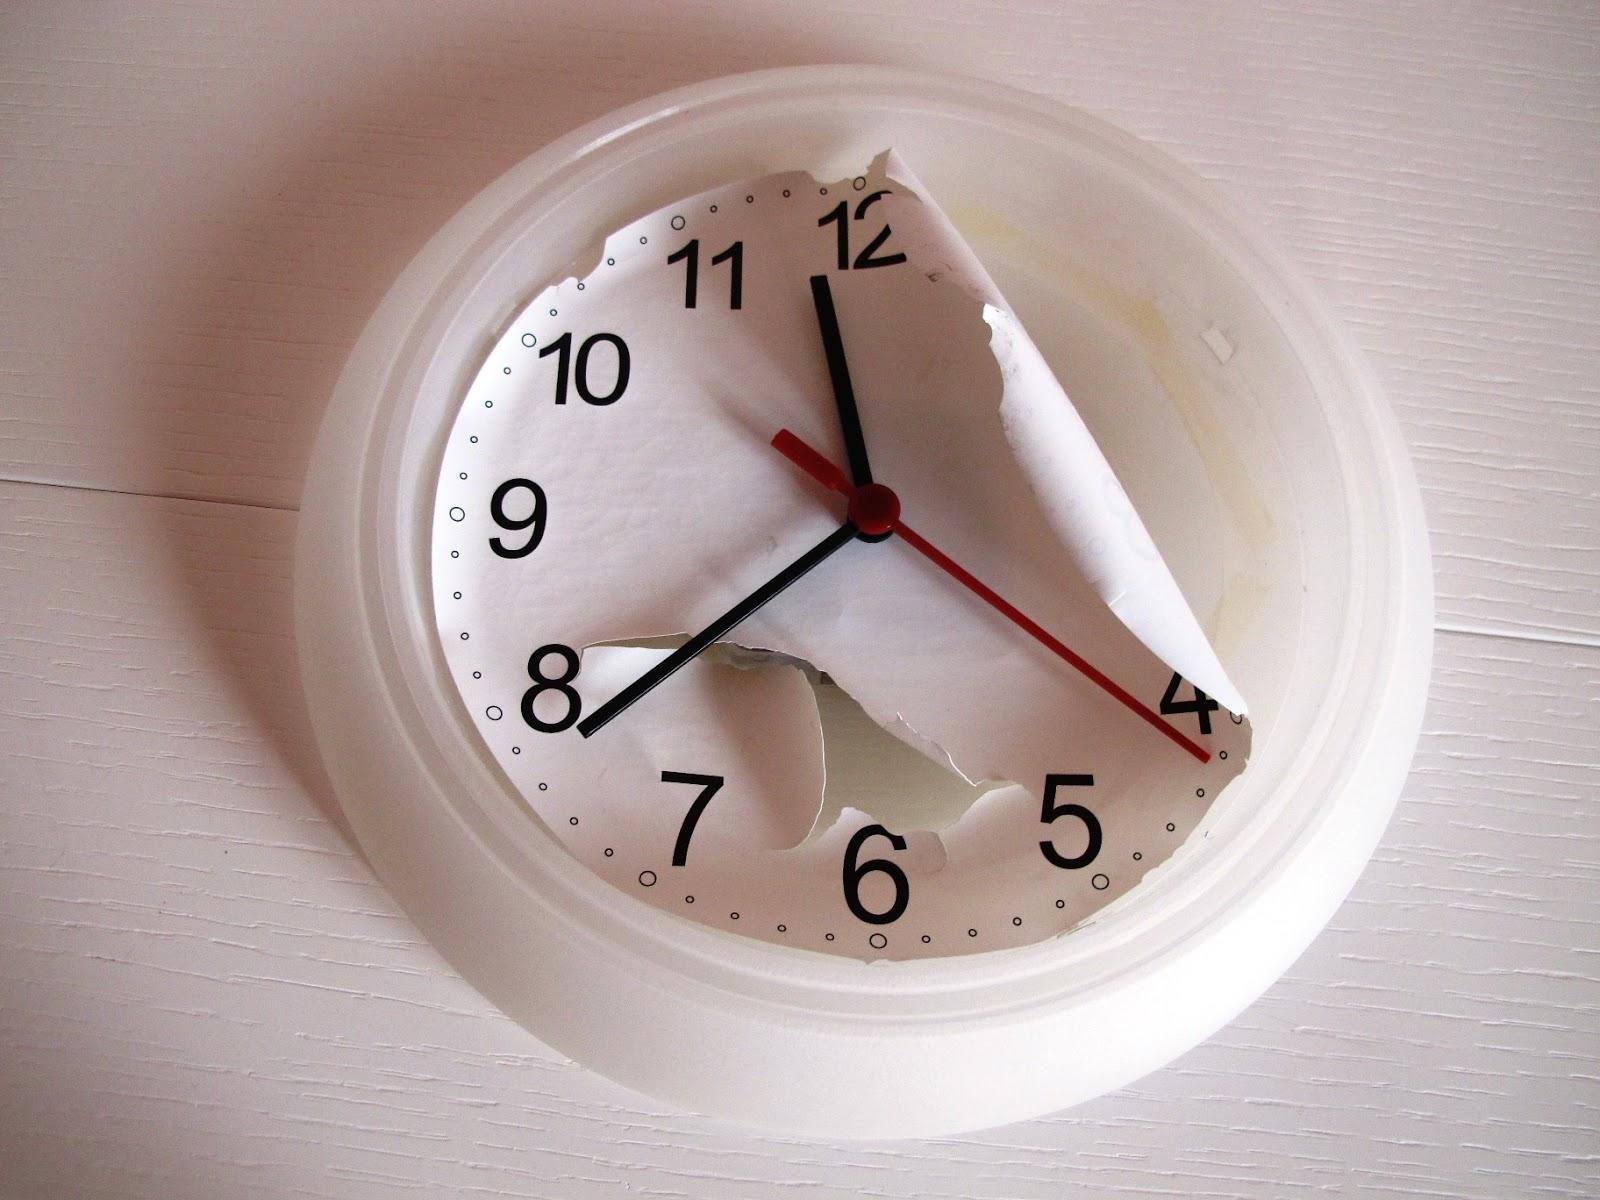 Angolino di liana nuovo look all 39 orologio ikea for Orologio ikea